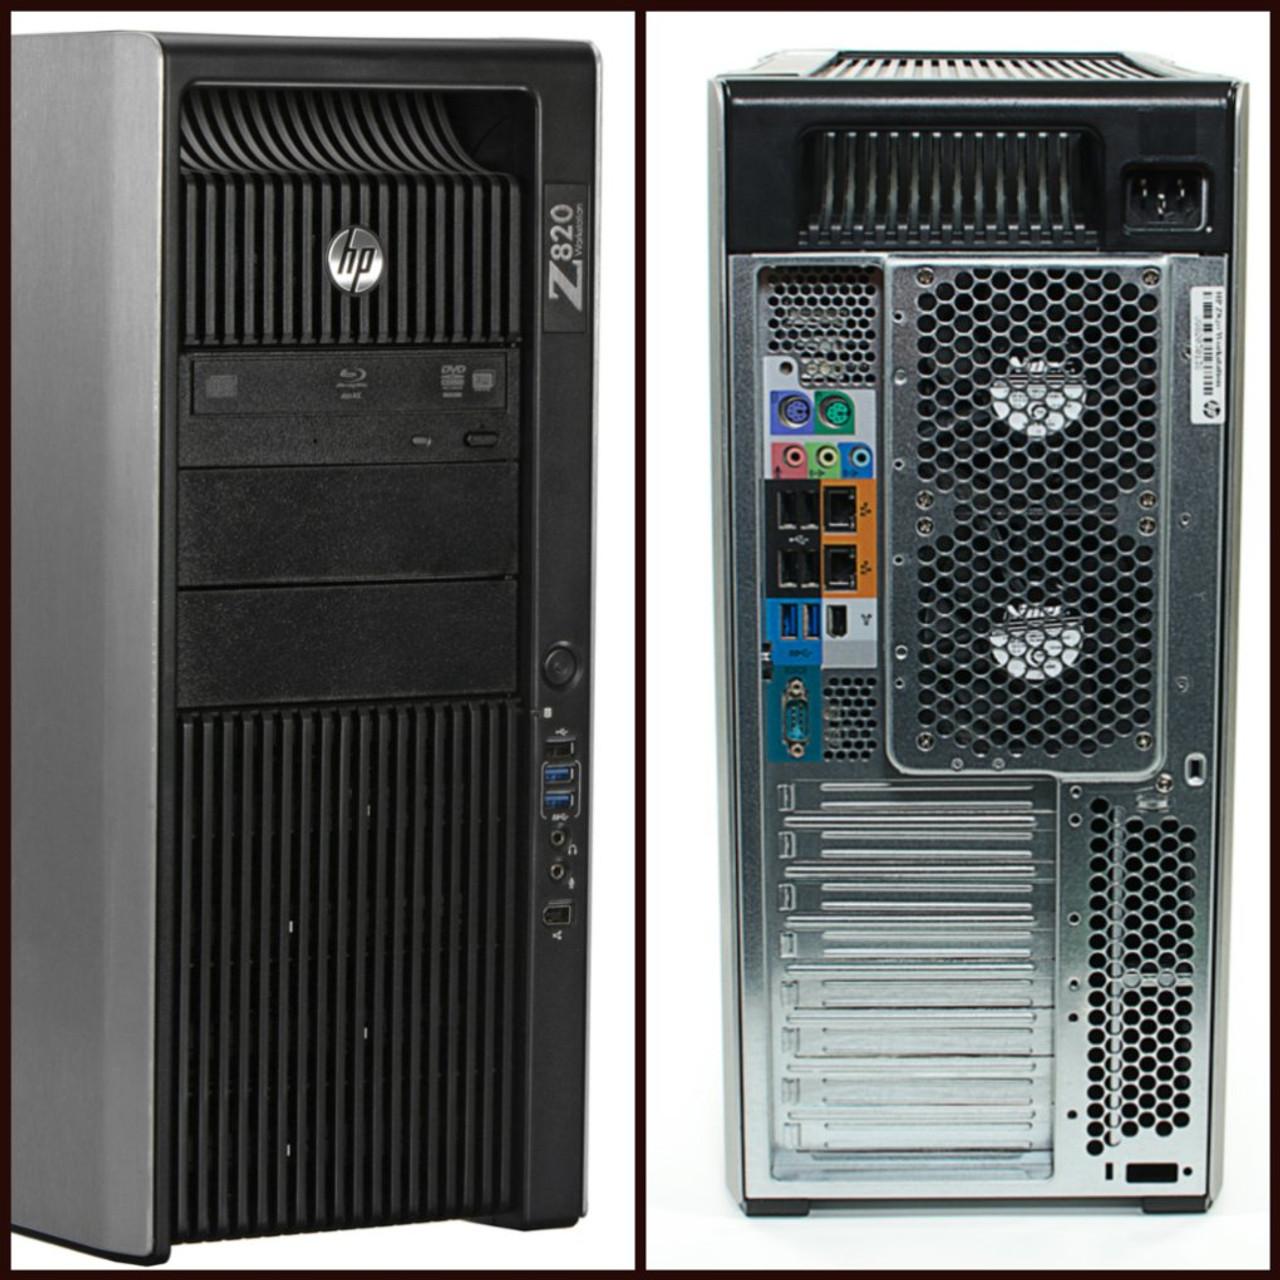 HP Workstation Z820 Tower Dual Eight Core Intel Xeon 2.60GHz, 32GB Ram, 500GB SSD, DVD-RW, Windows 10 Pro 64 Desktop Computer